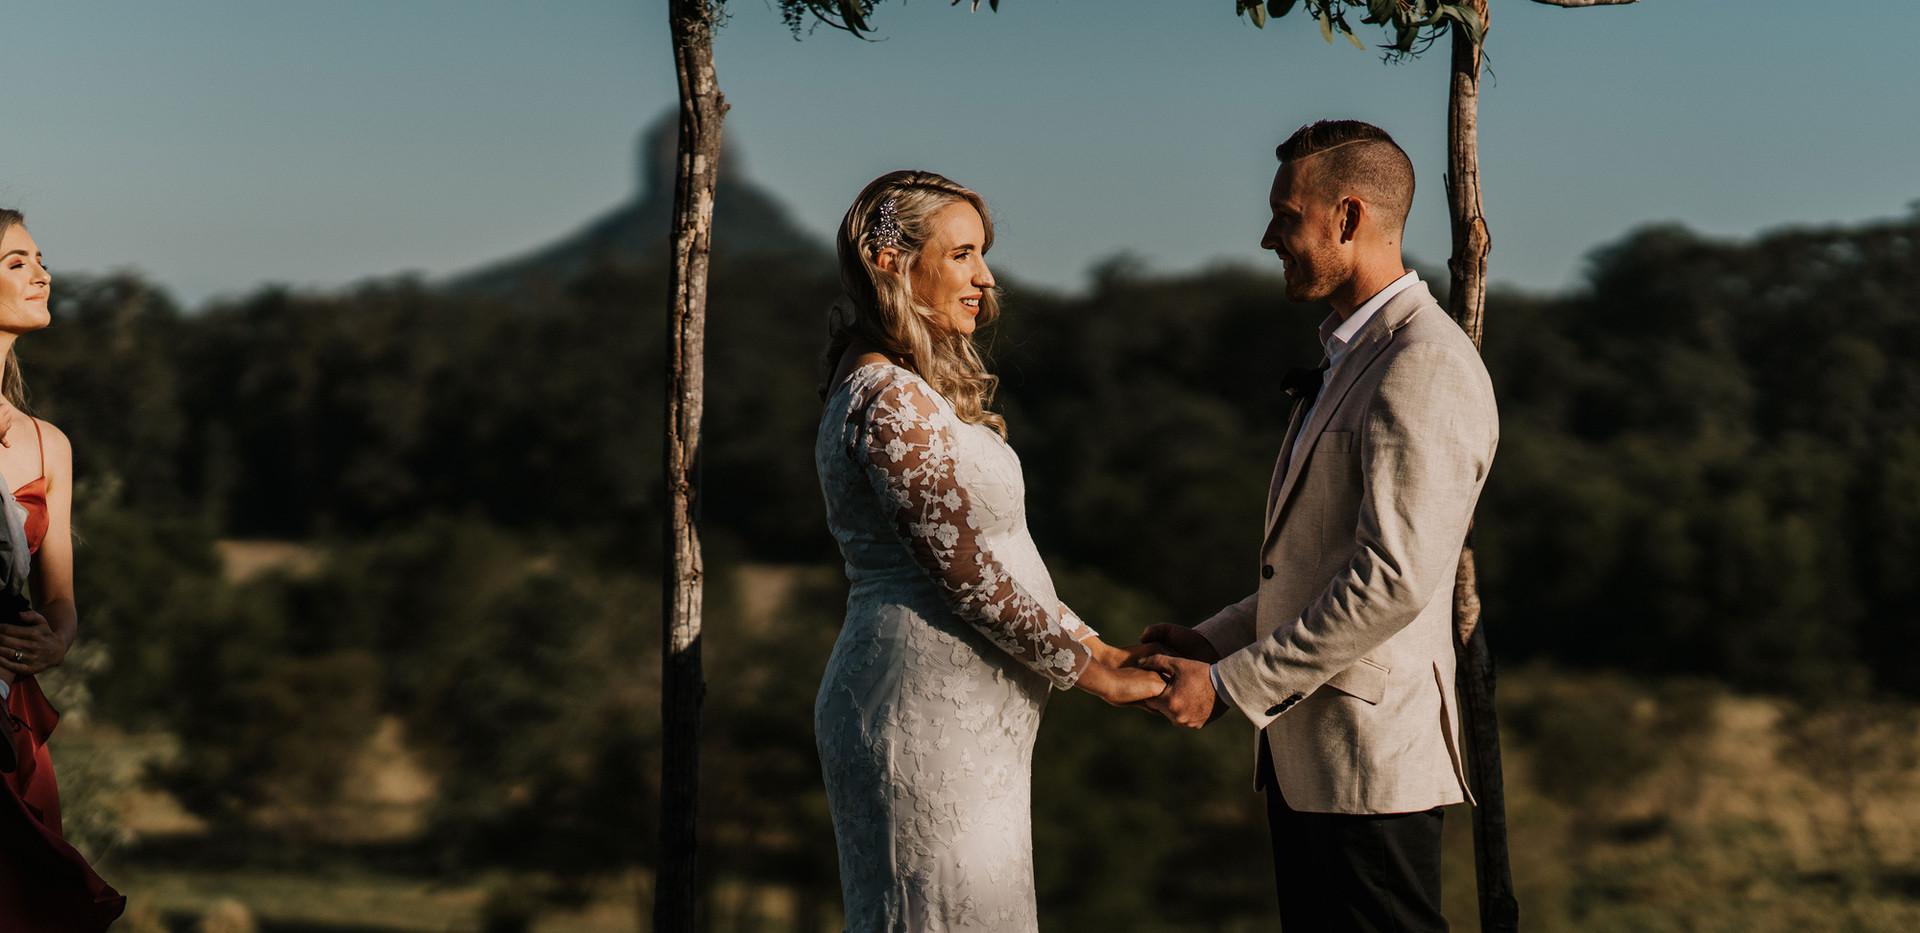 Wedding ceremony styling.jpg